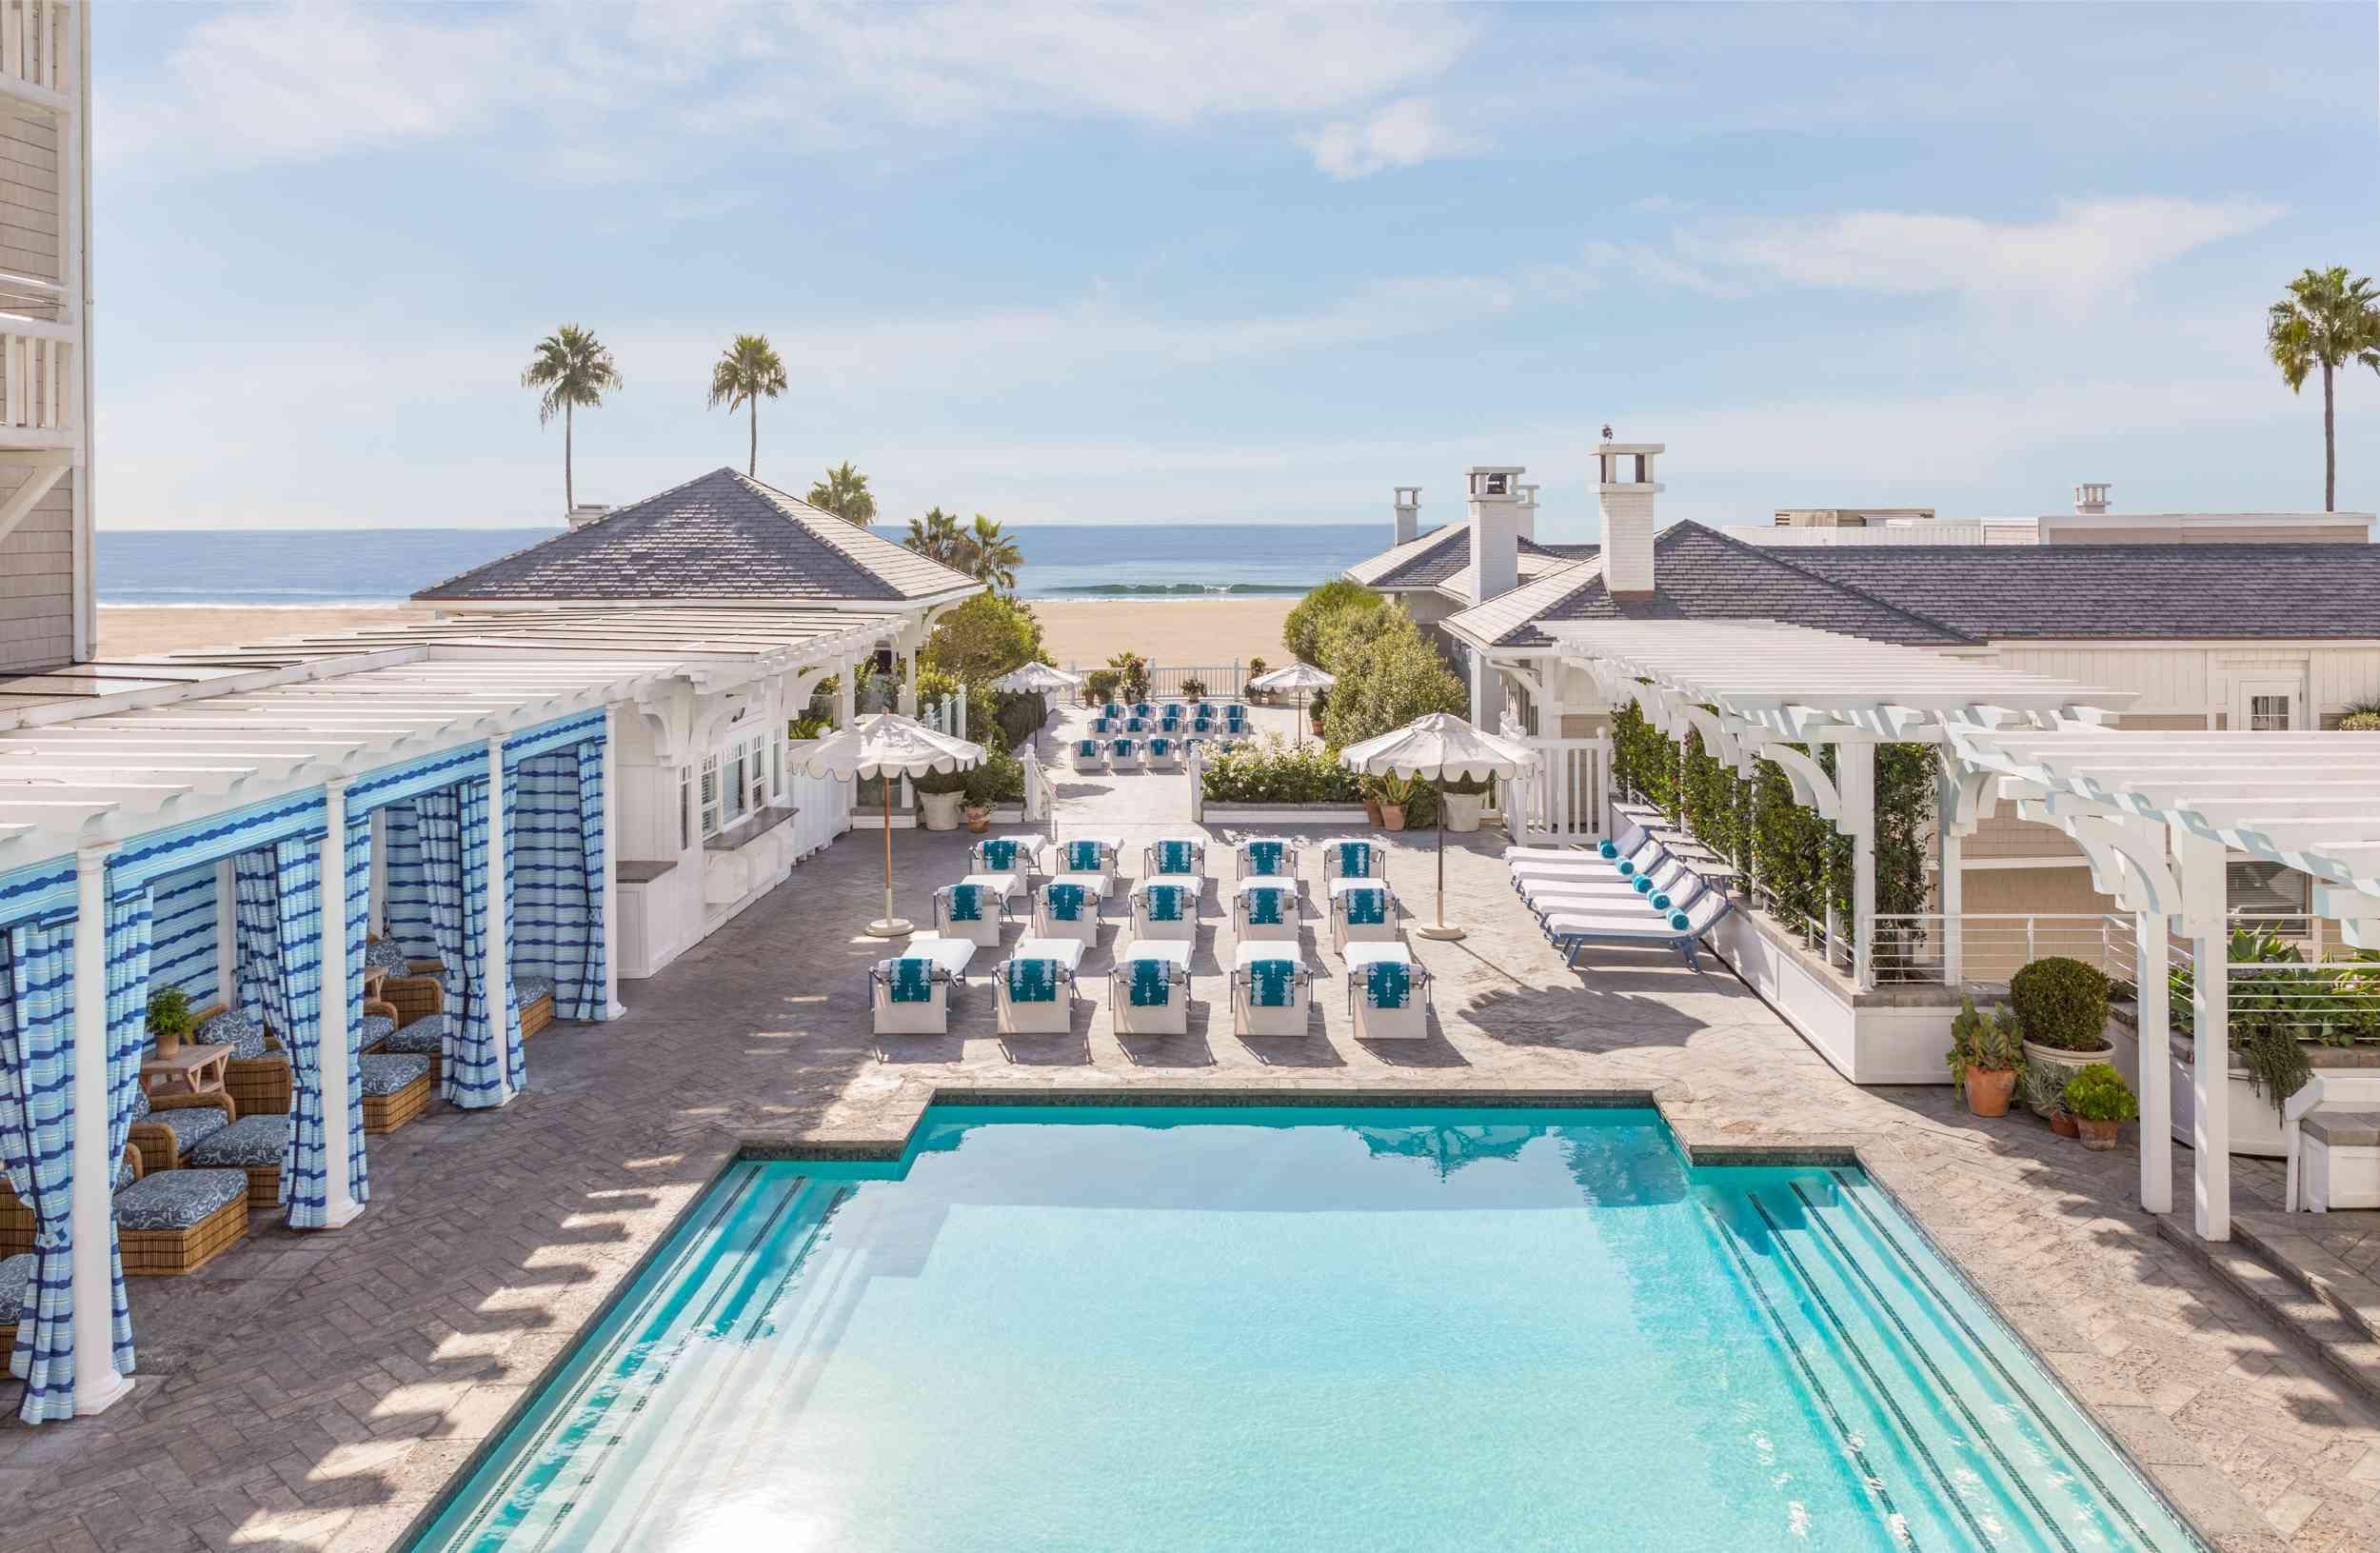 The Best Beachfront Hotels Resorts In California